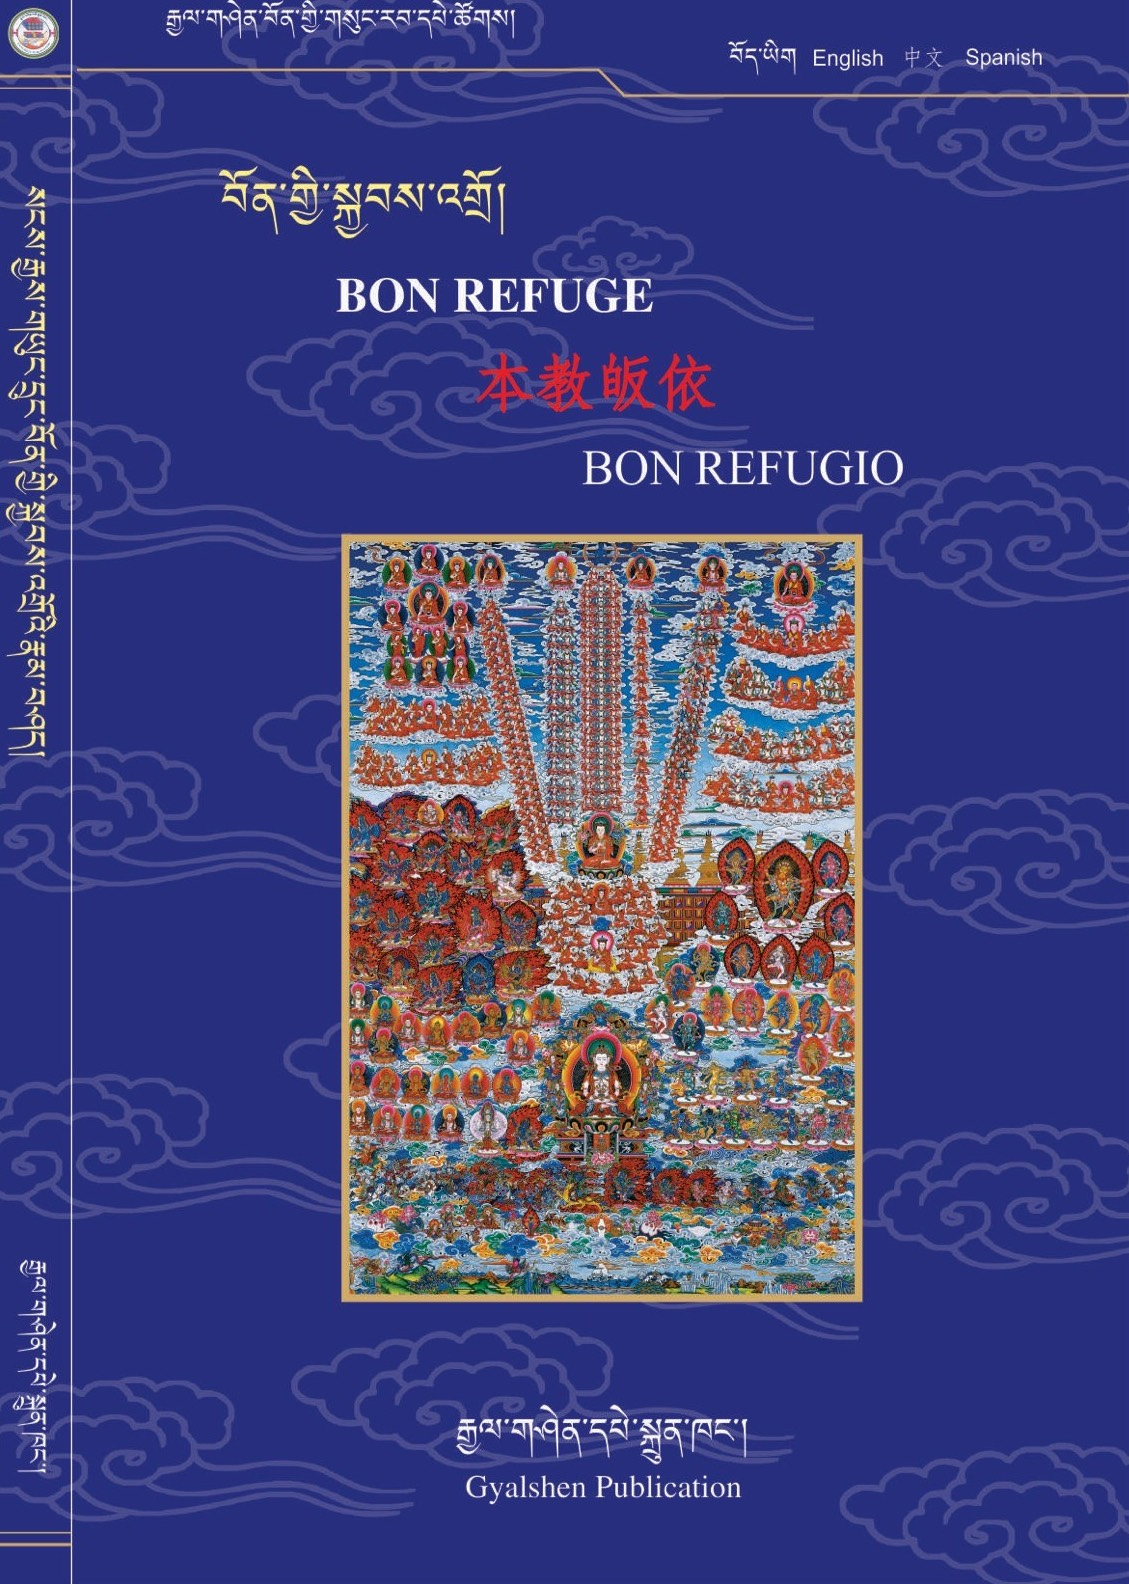 Bonpo Refuge